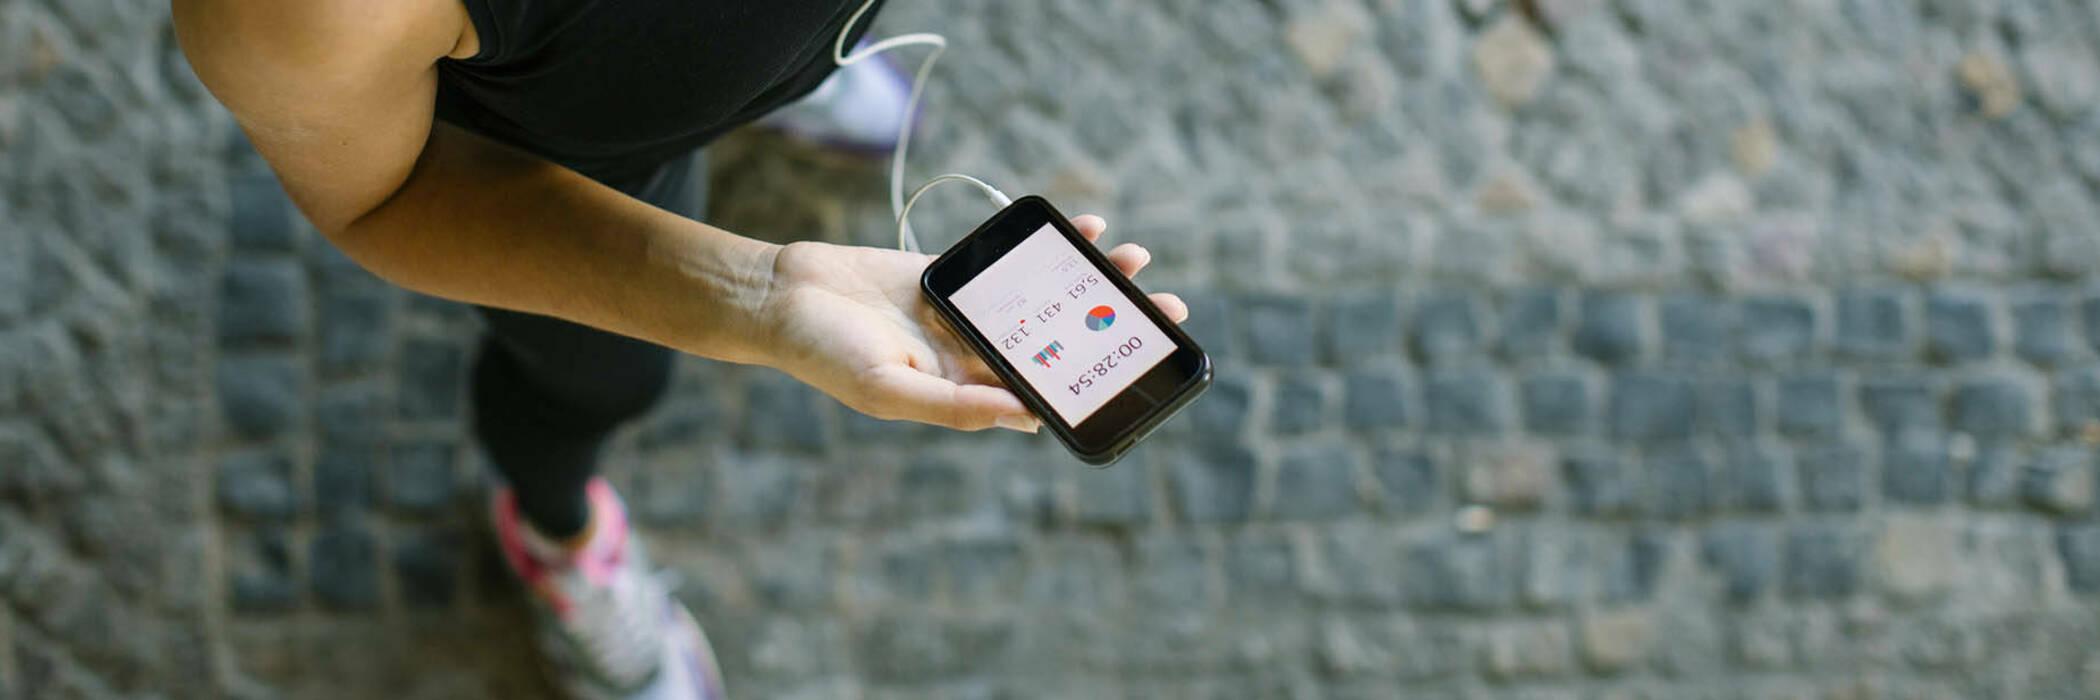 Woman using fitness app on phone.